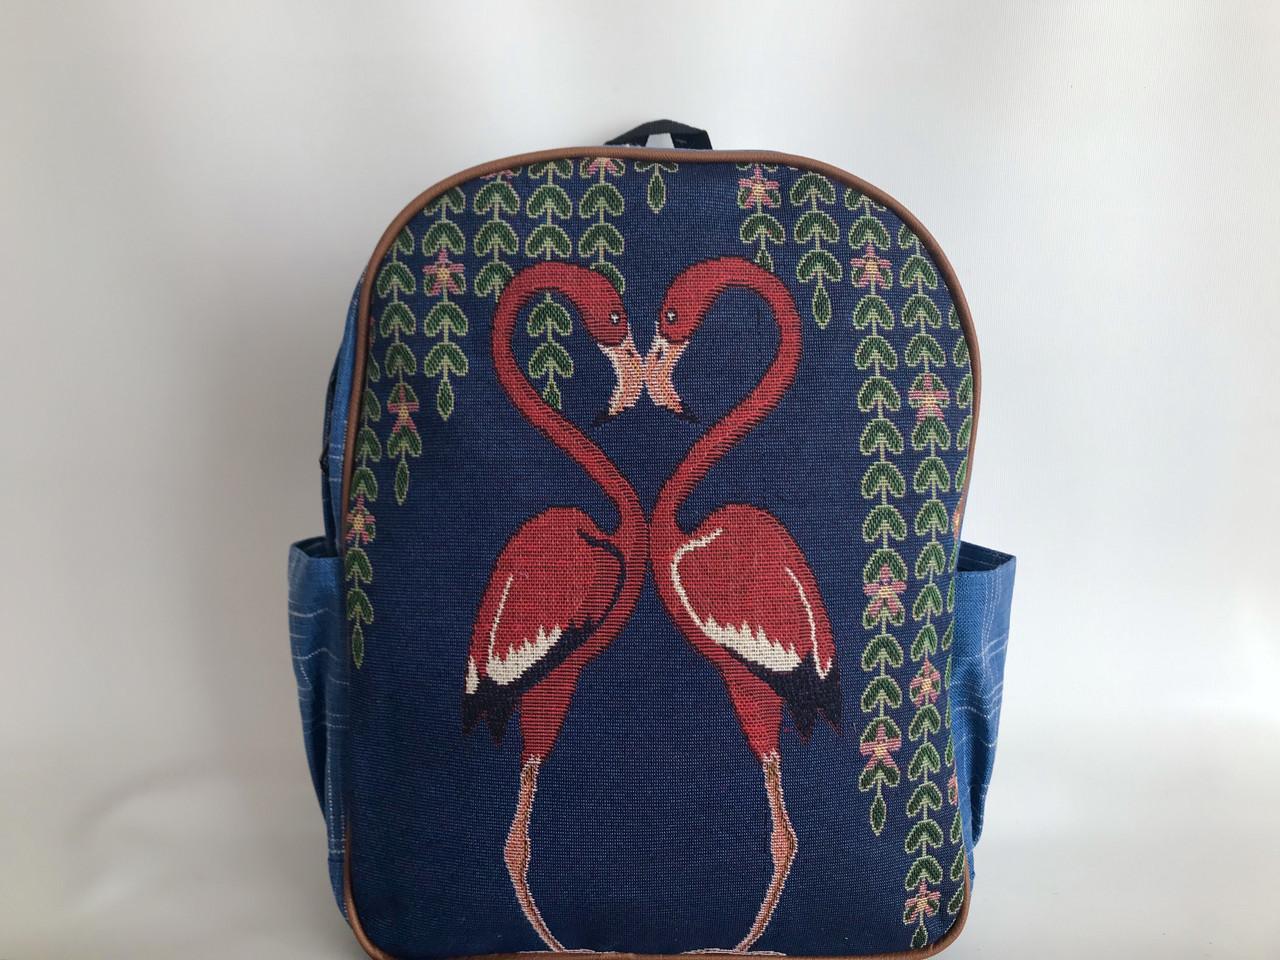 b37a602bf72e Рюкзак Тканевый Женский Городской Фламинго — в Категории